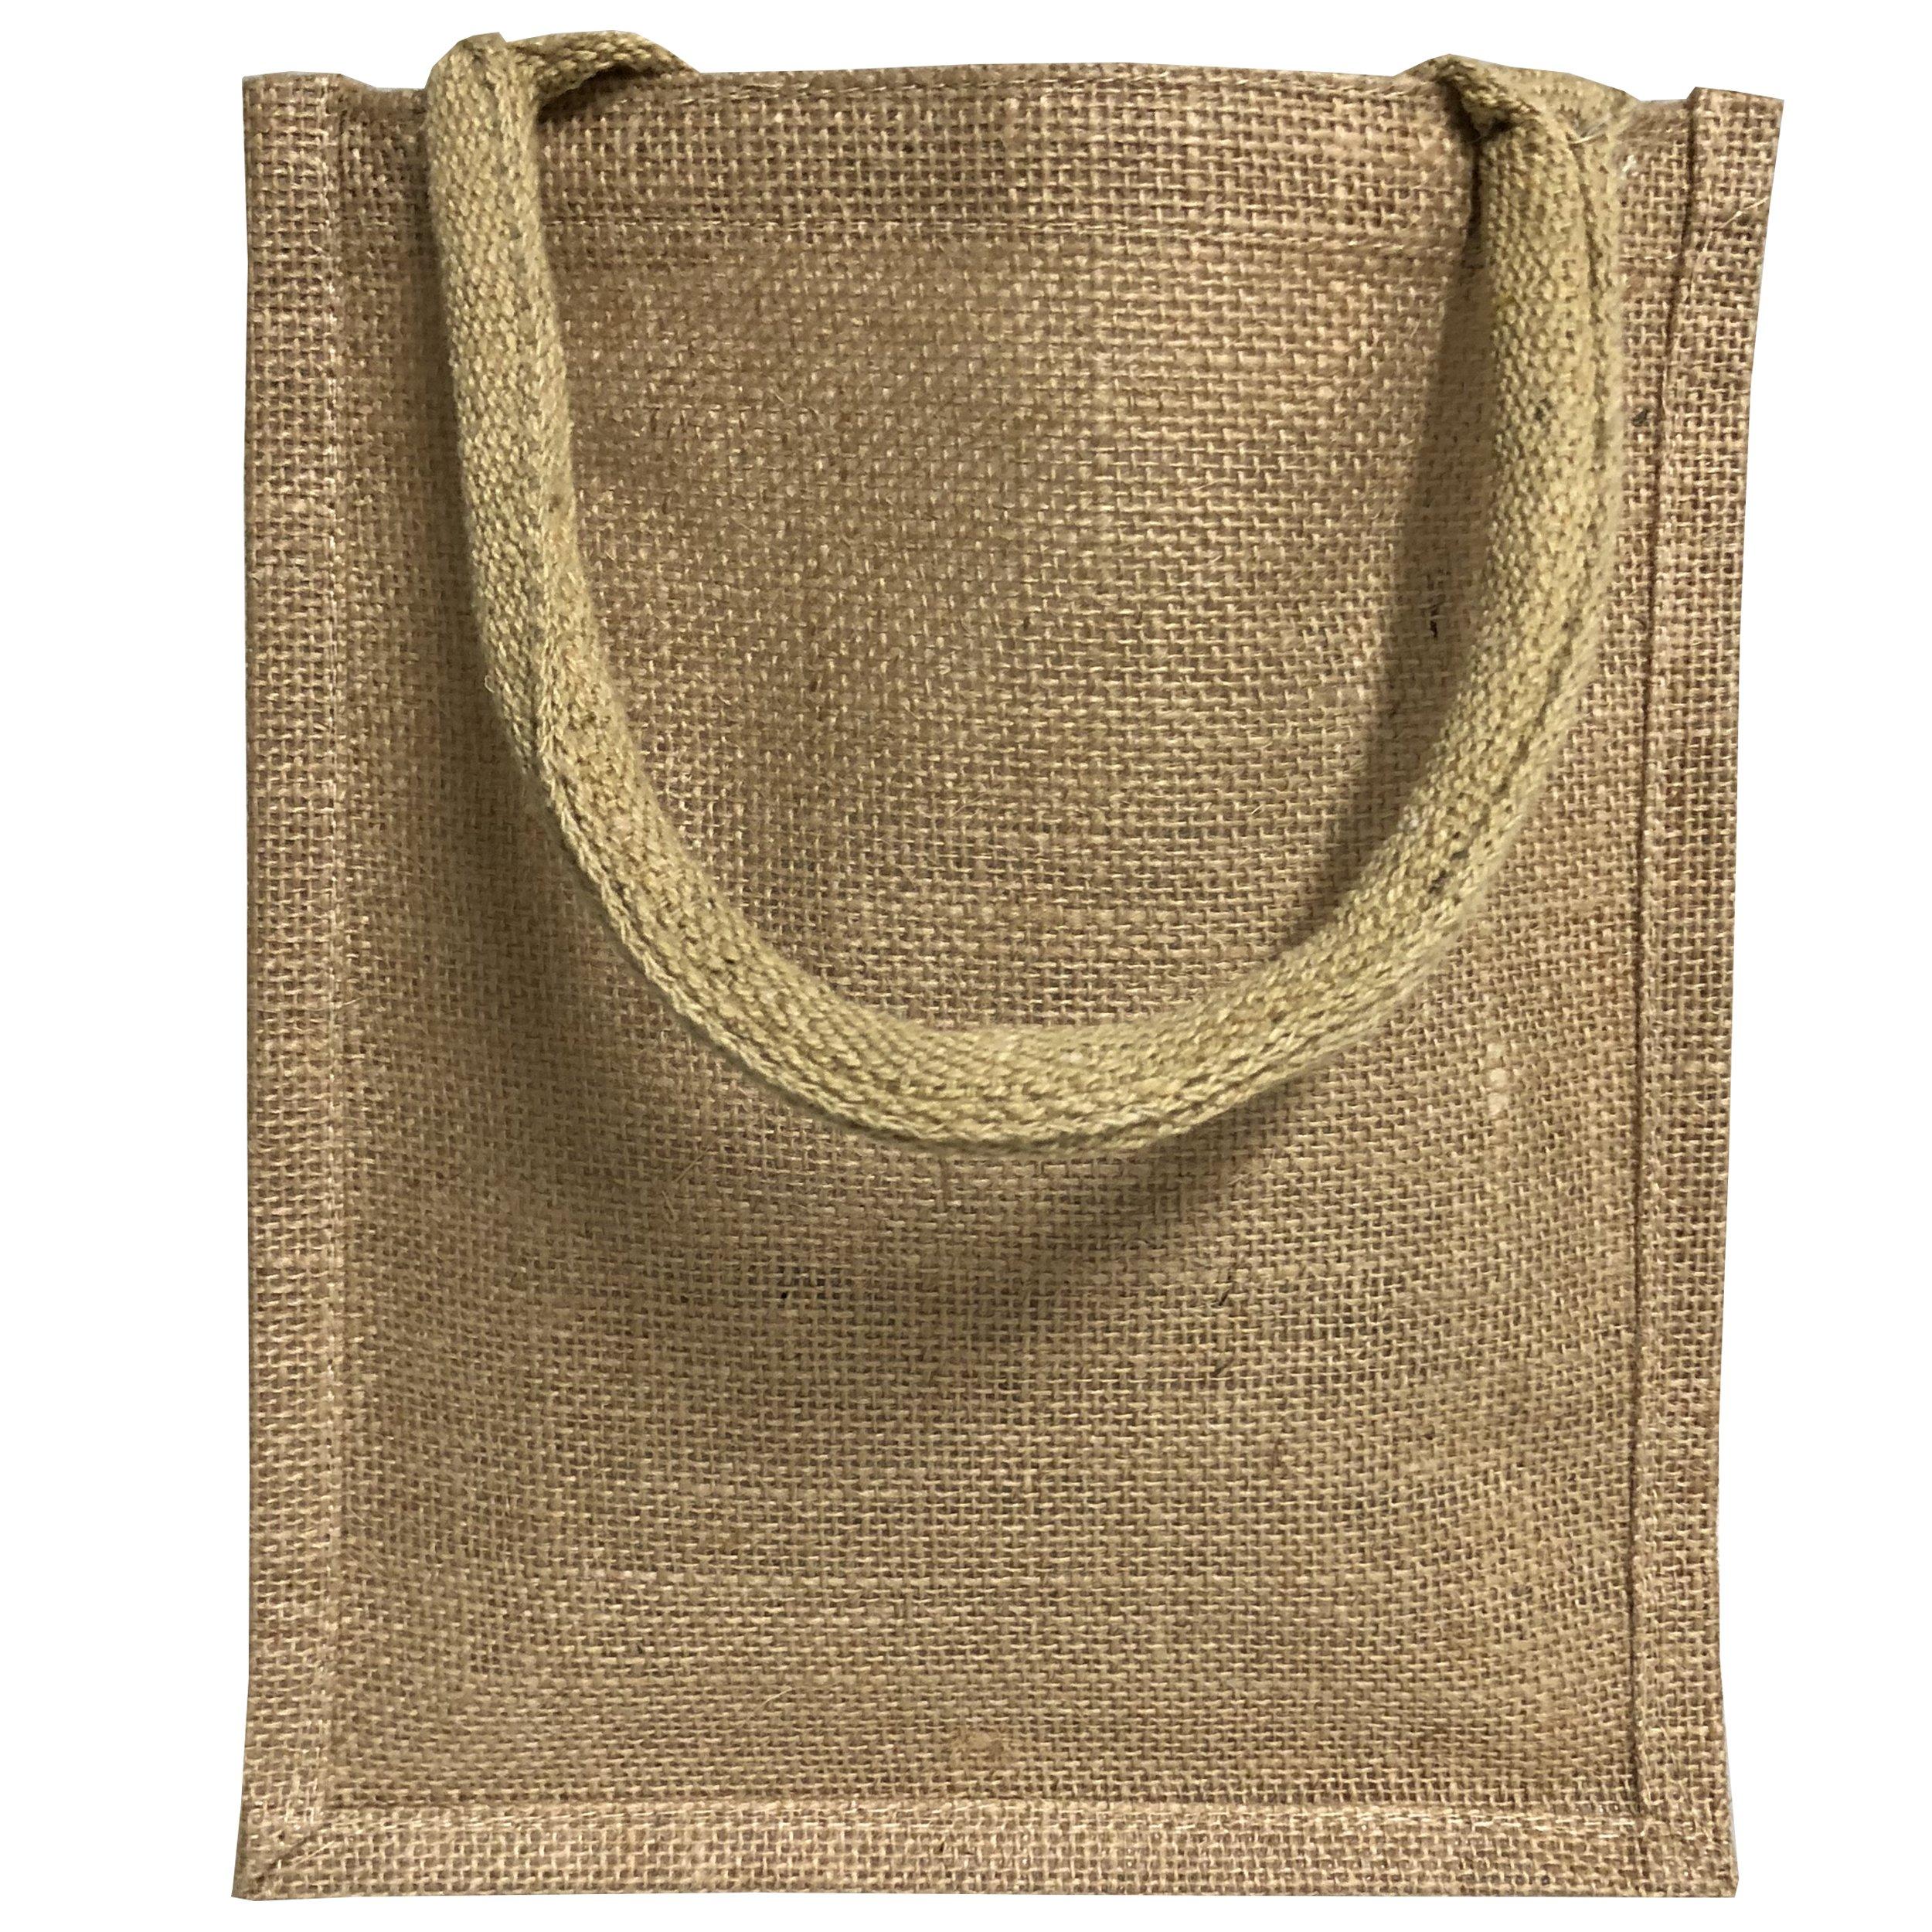 Small Burlap Bags Jute Burlap Gift Bags Bulk B887